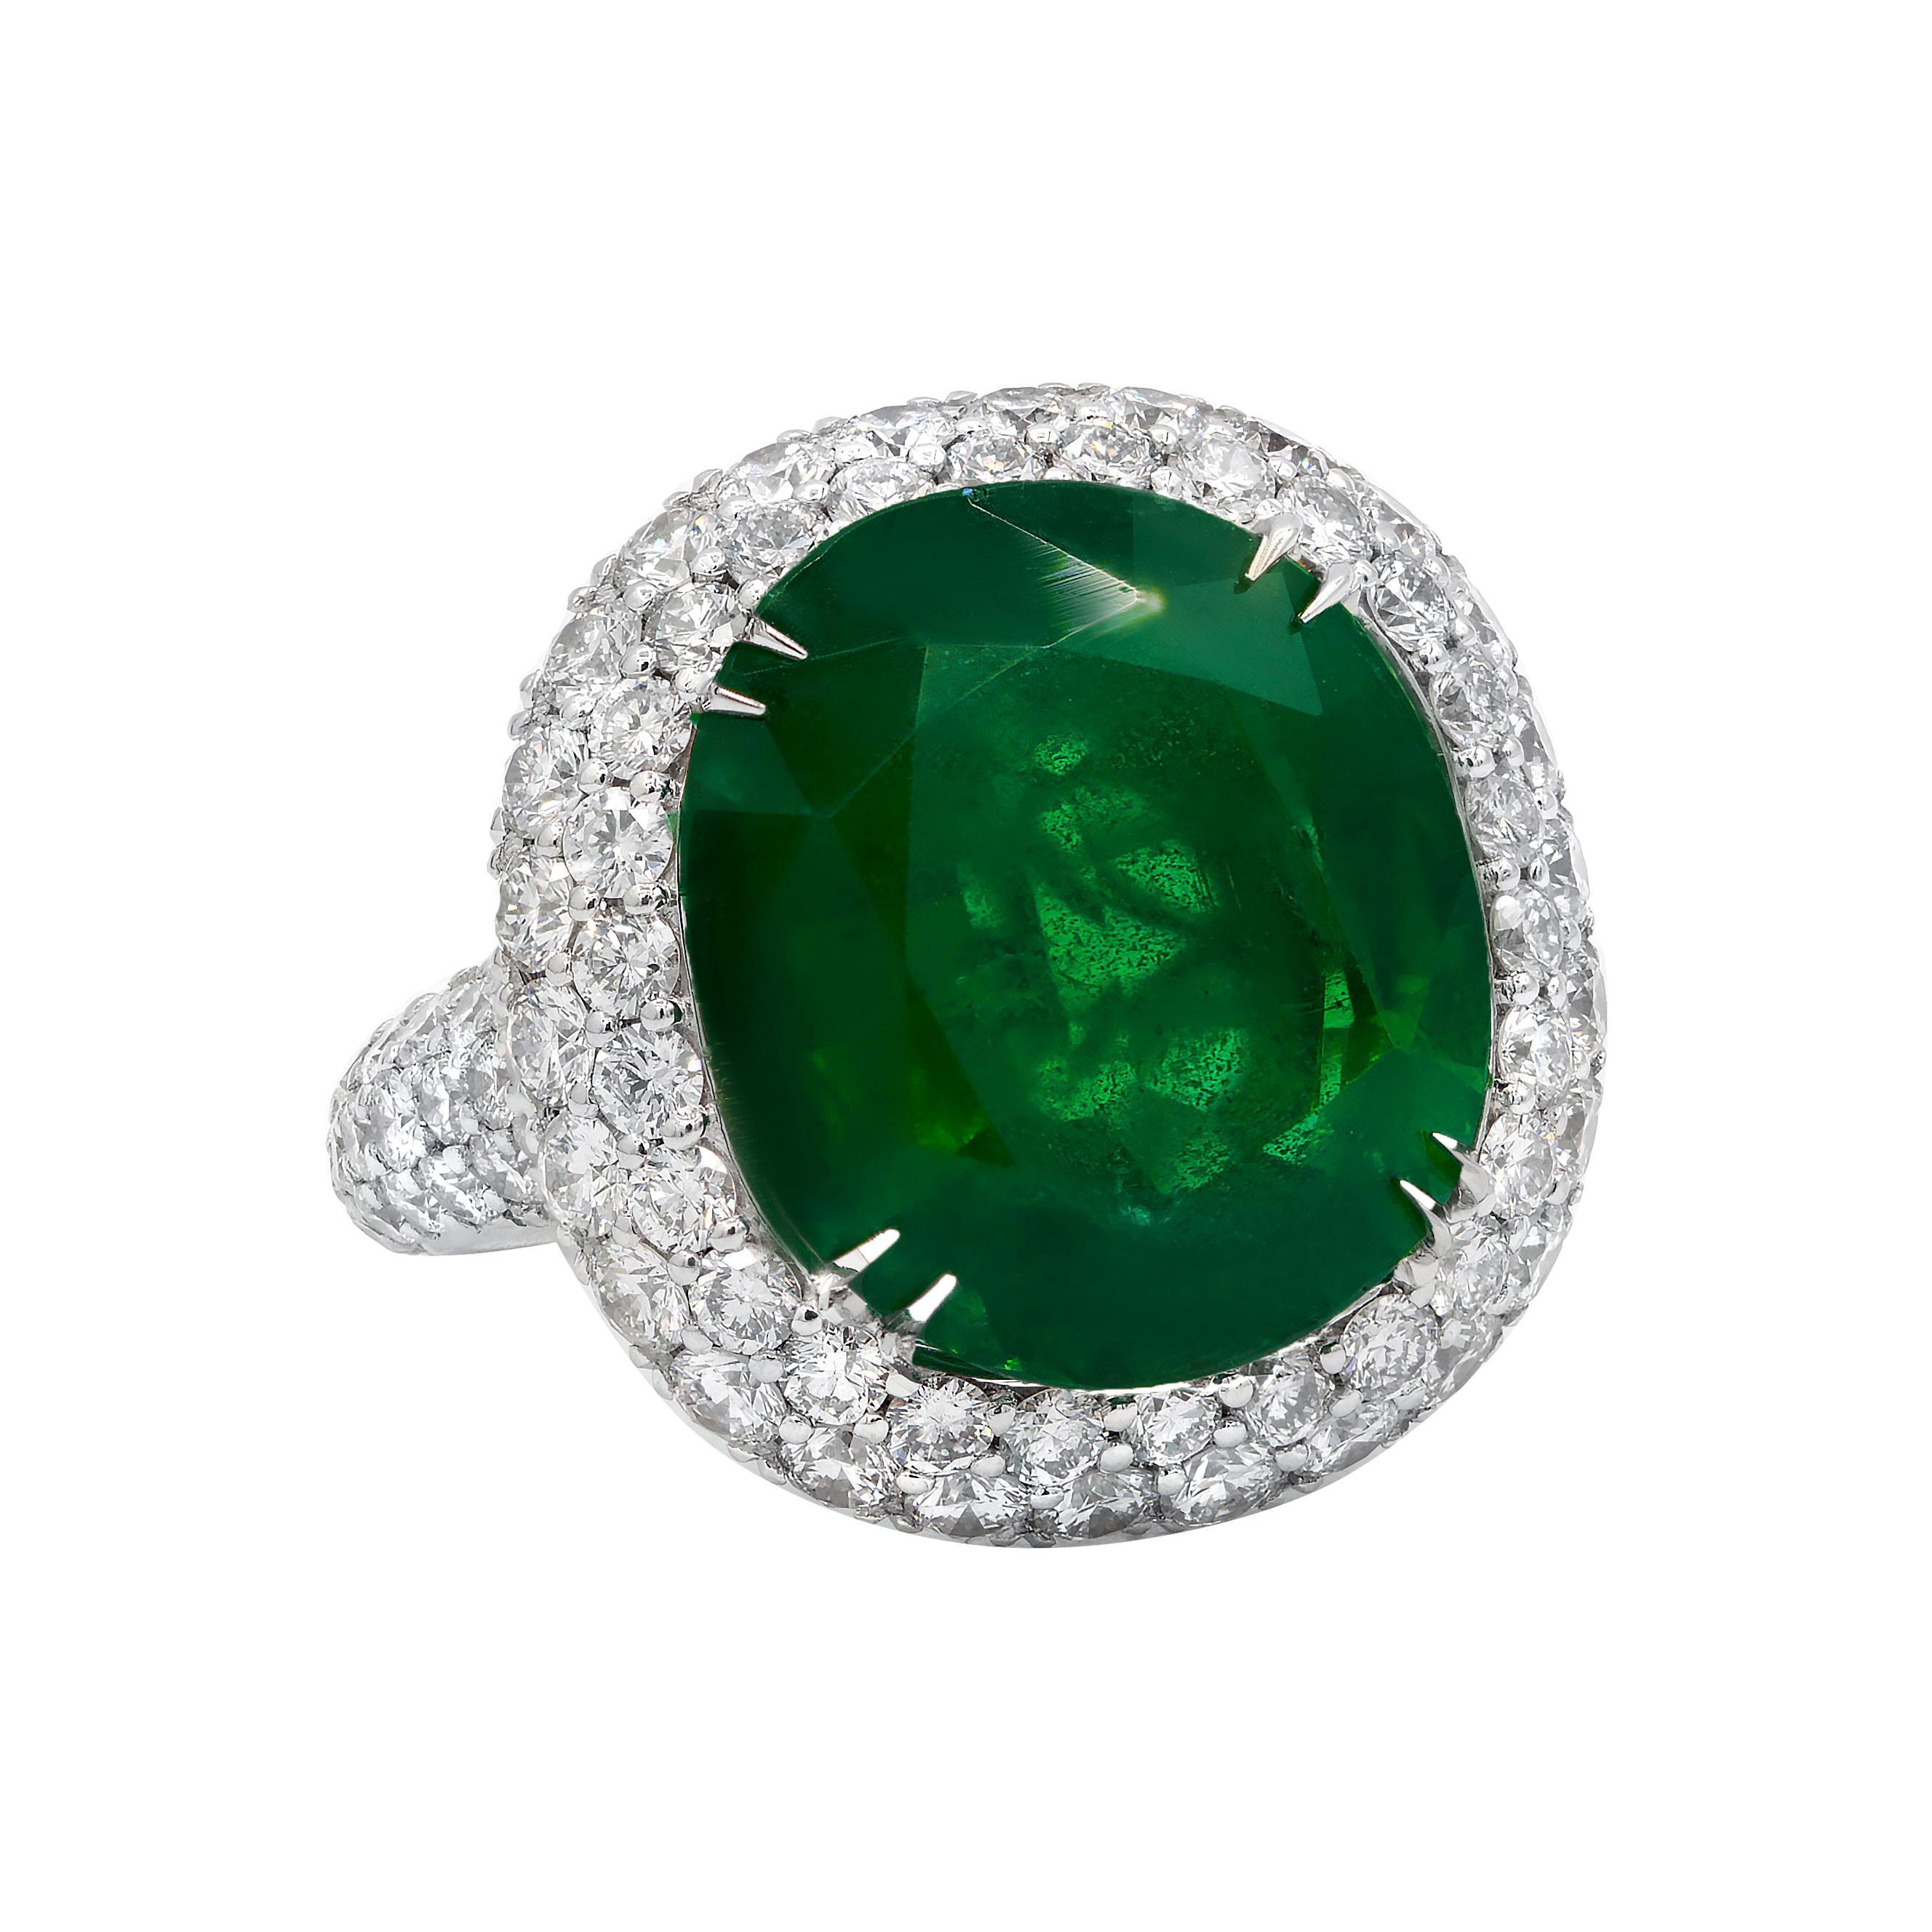 GIA Certified 10.95 Carat Green Emerald Diamond Ring